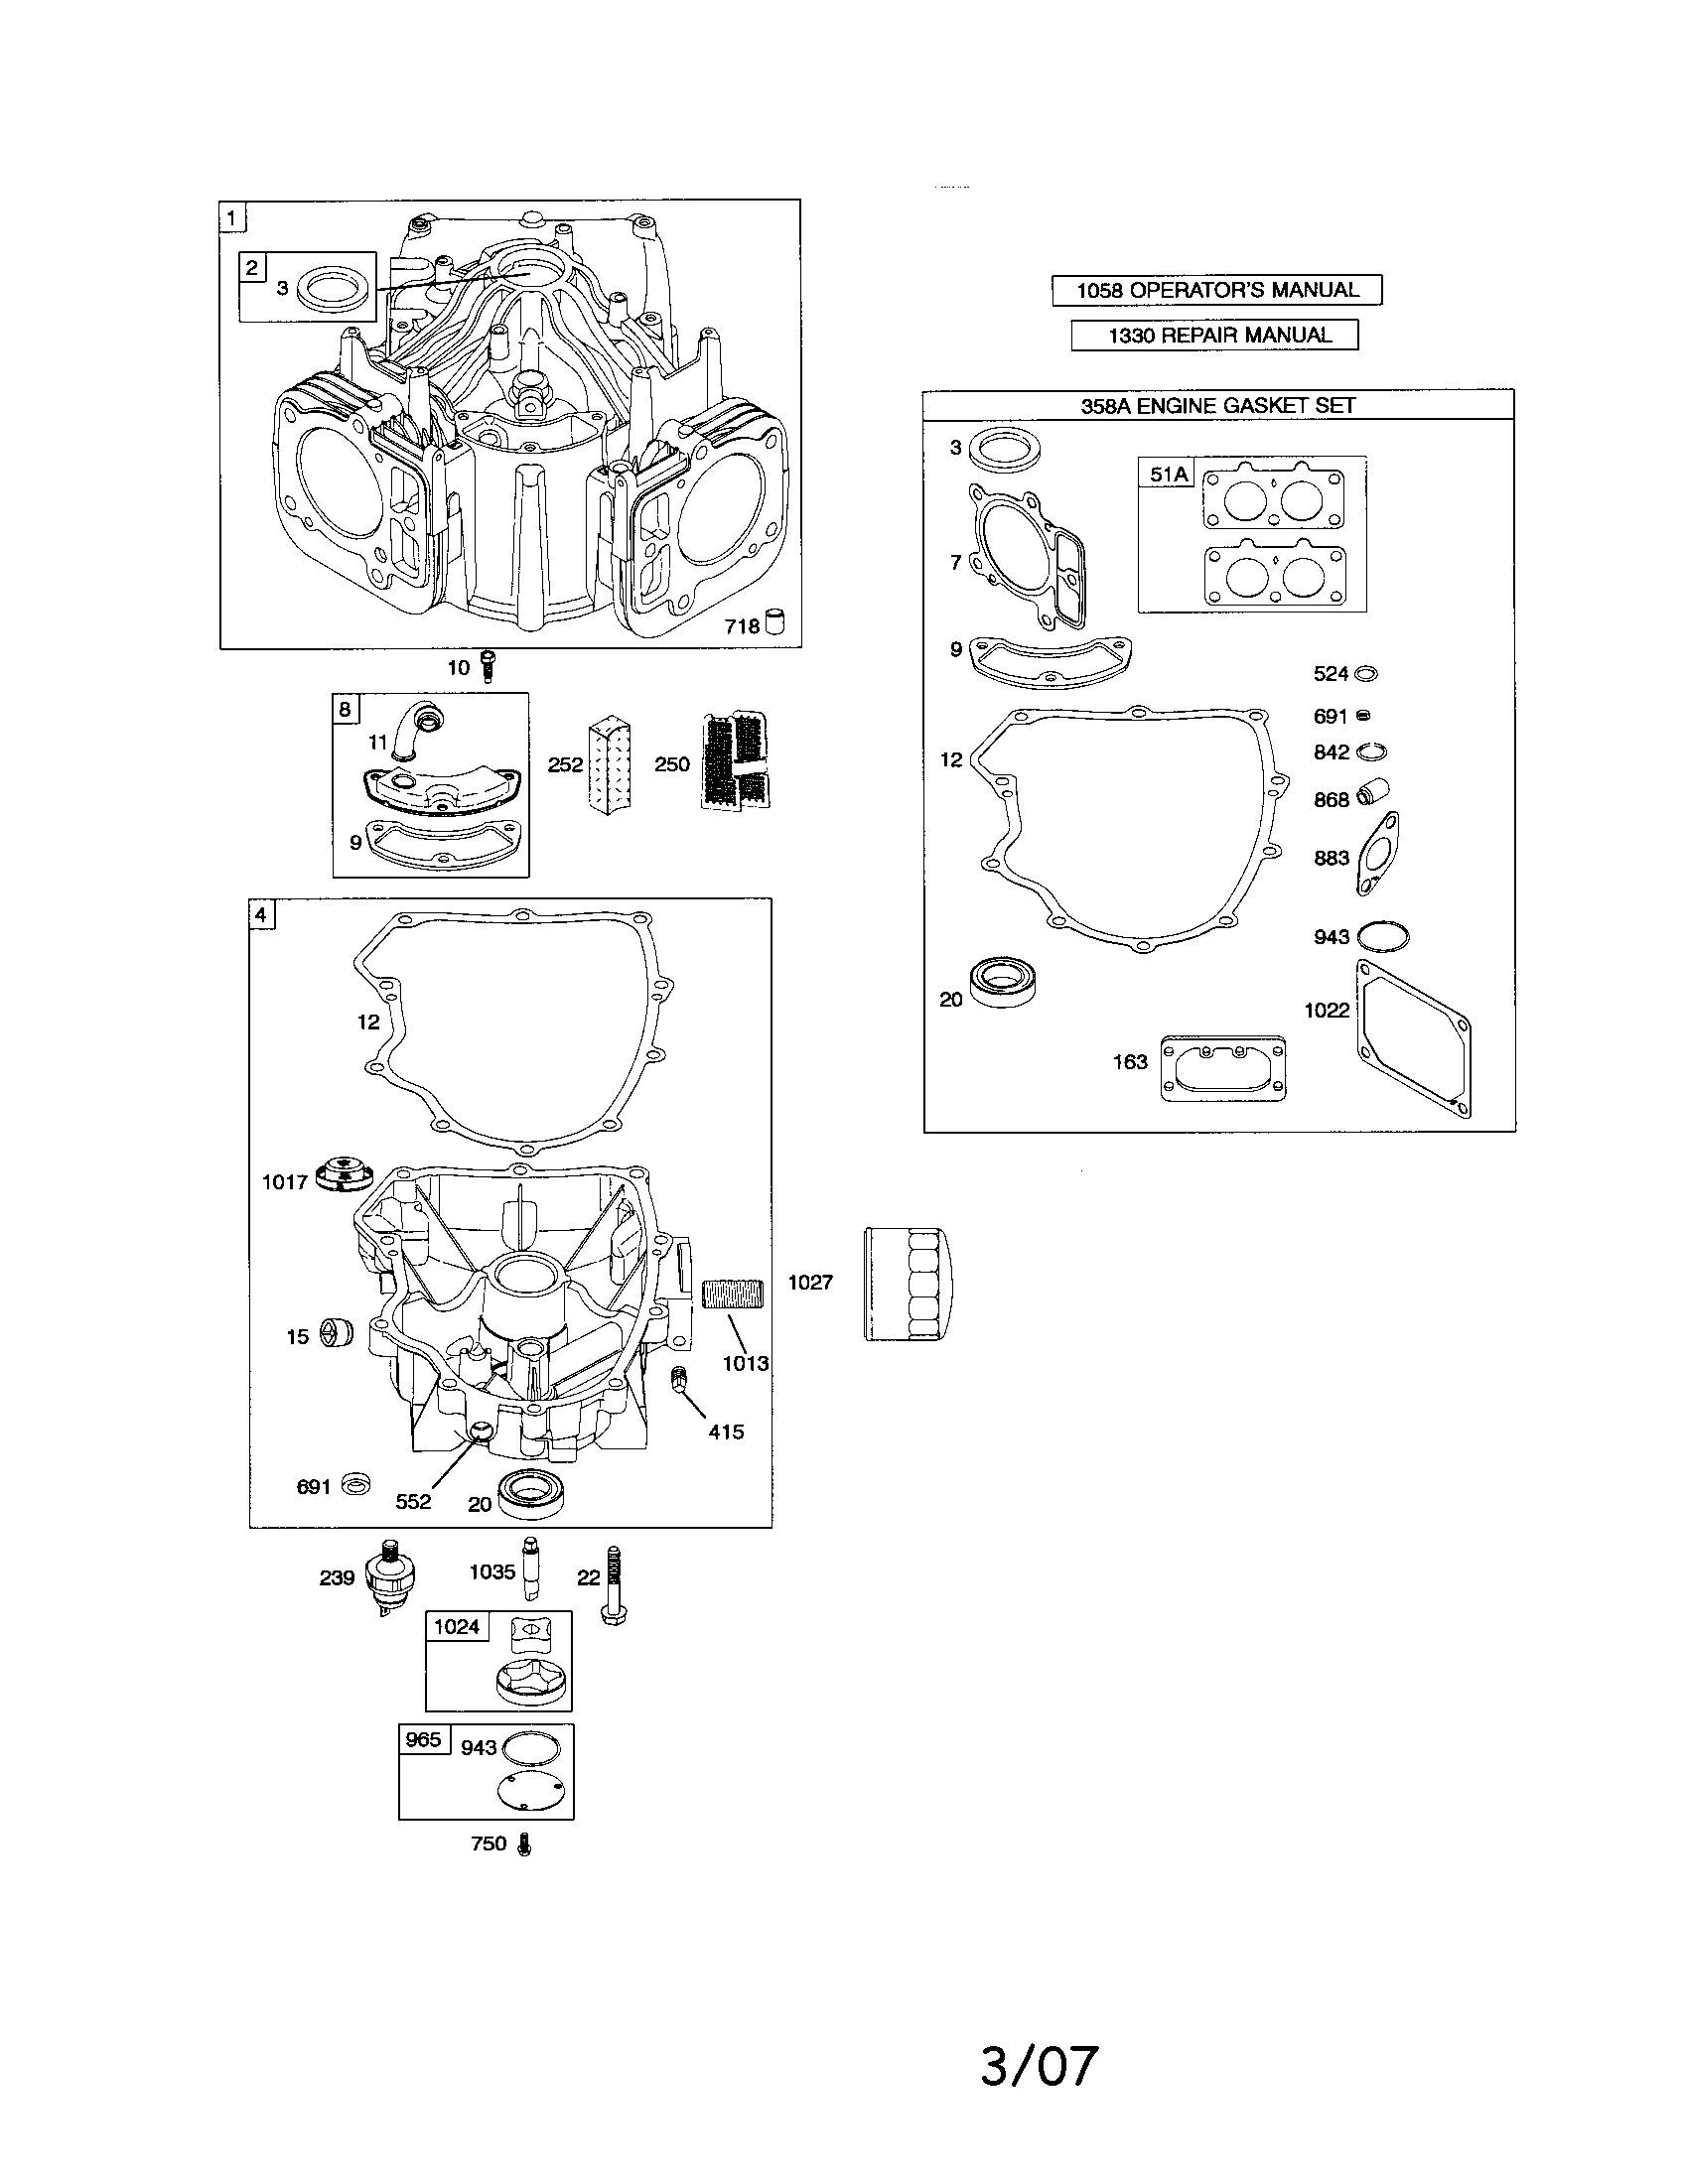 Wiring Diagram Model 44m777 B&s Looking for Briggs & Stratton Model 44m777 0113 E1 Lawn & Garden Engine Repair & Replacement Parts Of Wiring Diagram Model 44m777 B&s